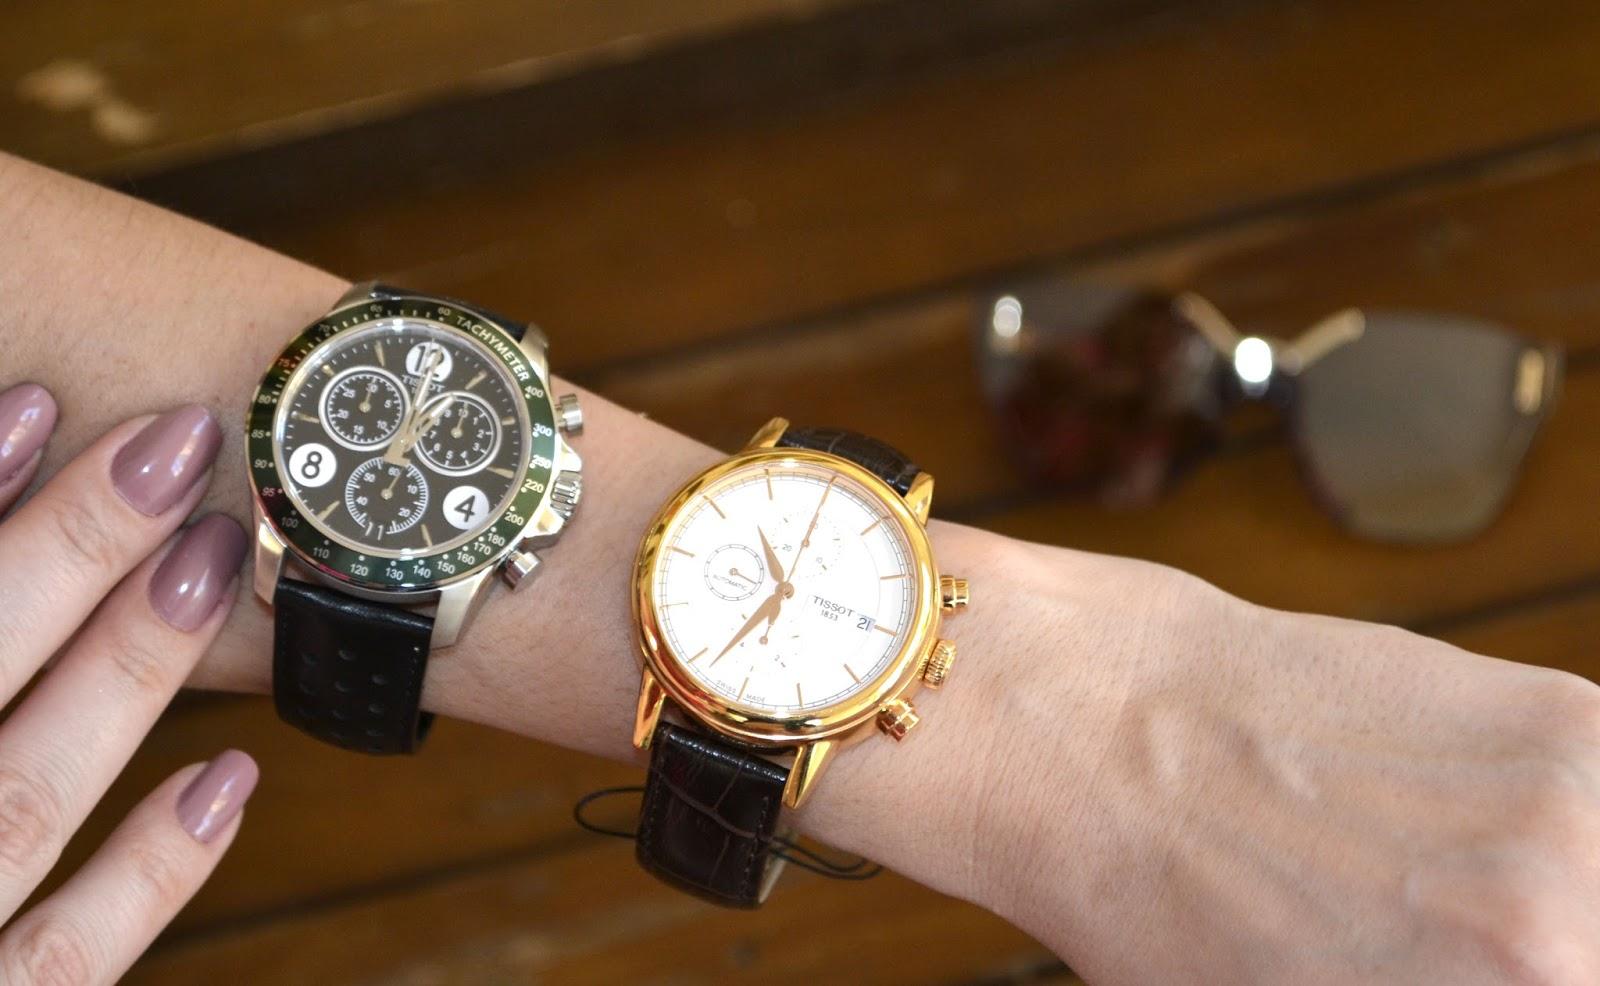 c3ebd3be96d Relógios Masculinos e Femininos da Marca Suíça Tissot.